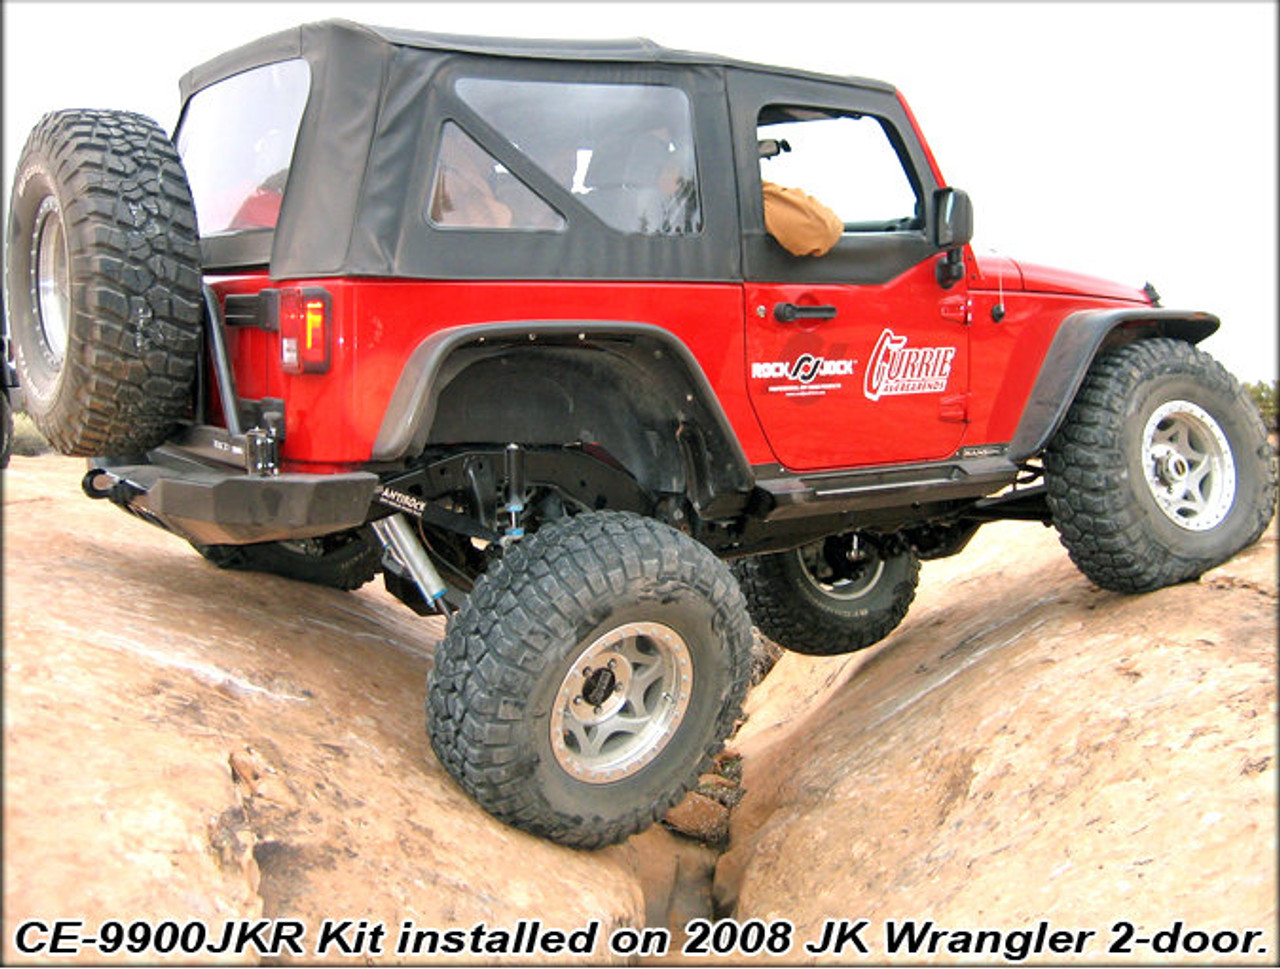 RockJock CE-9900JKRA Rear AntiRock Sway Bar Kit for Jeep Wrangler JK 2 Door 2007-2018